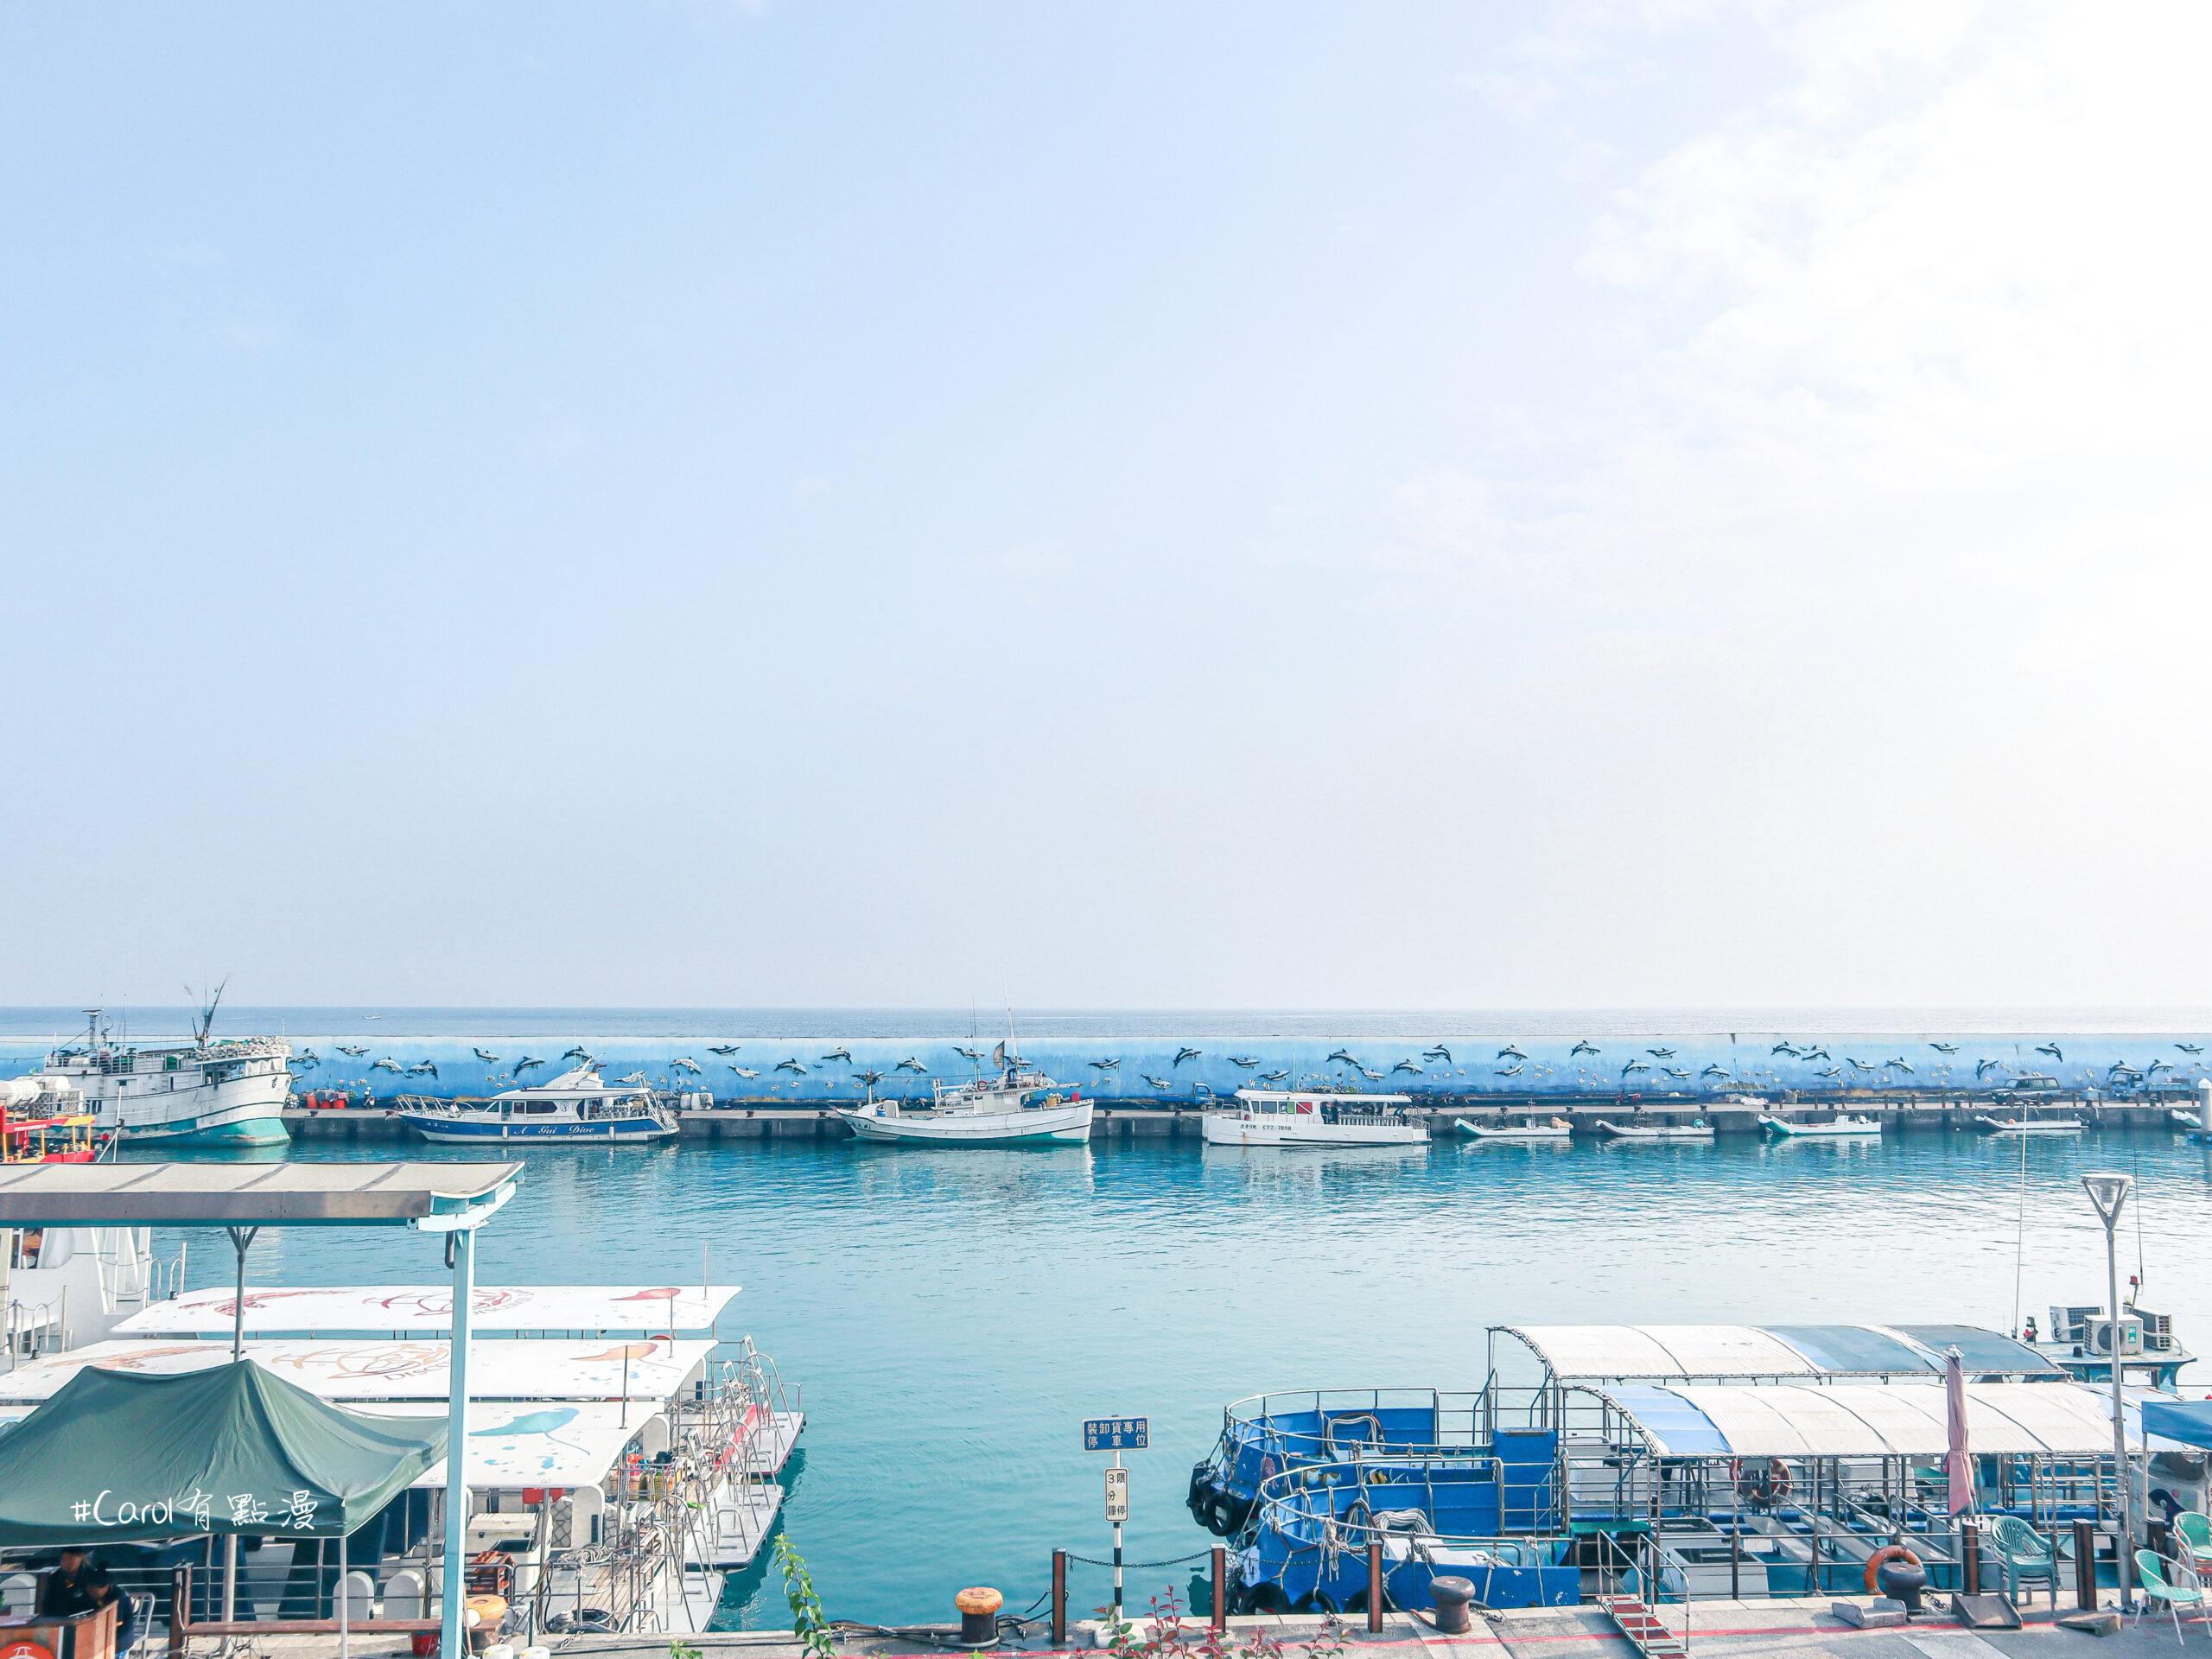 4_Carol_觀光漁港